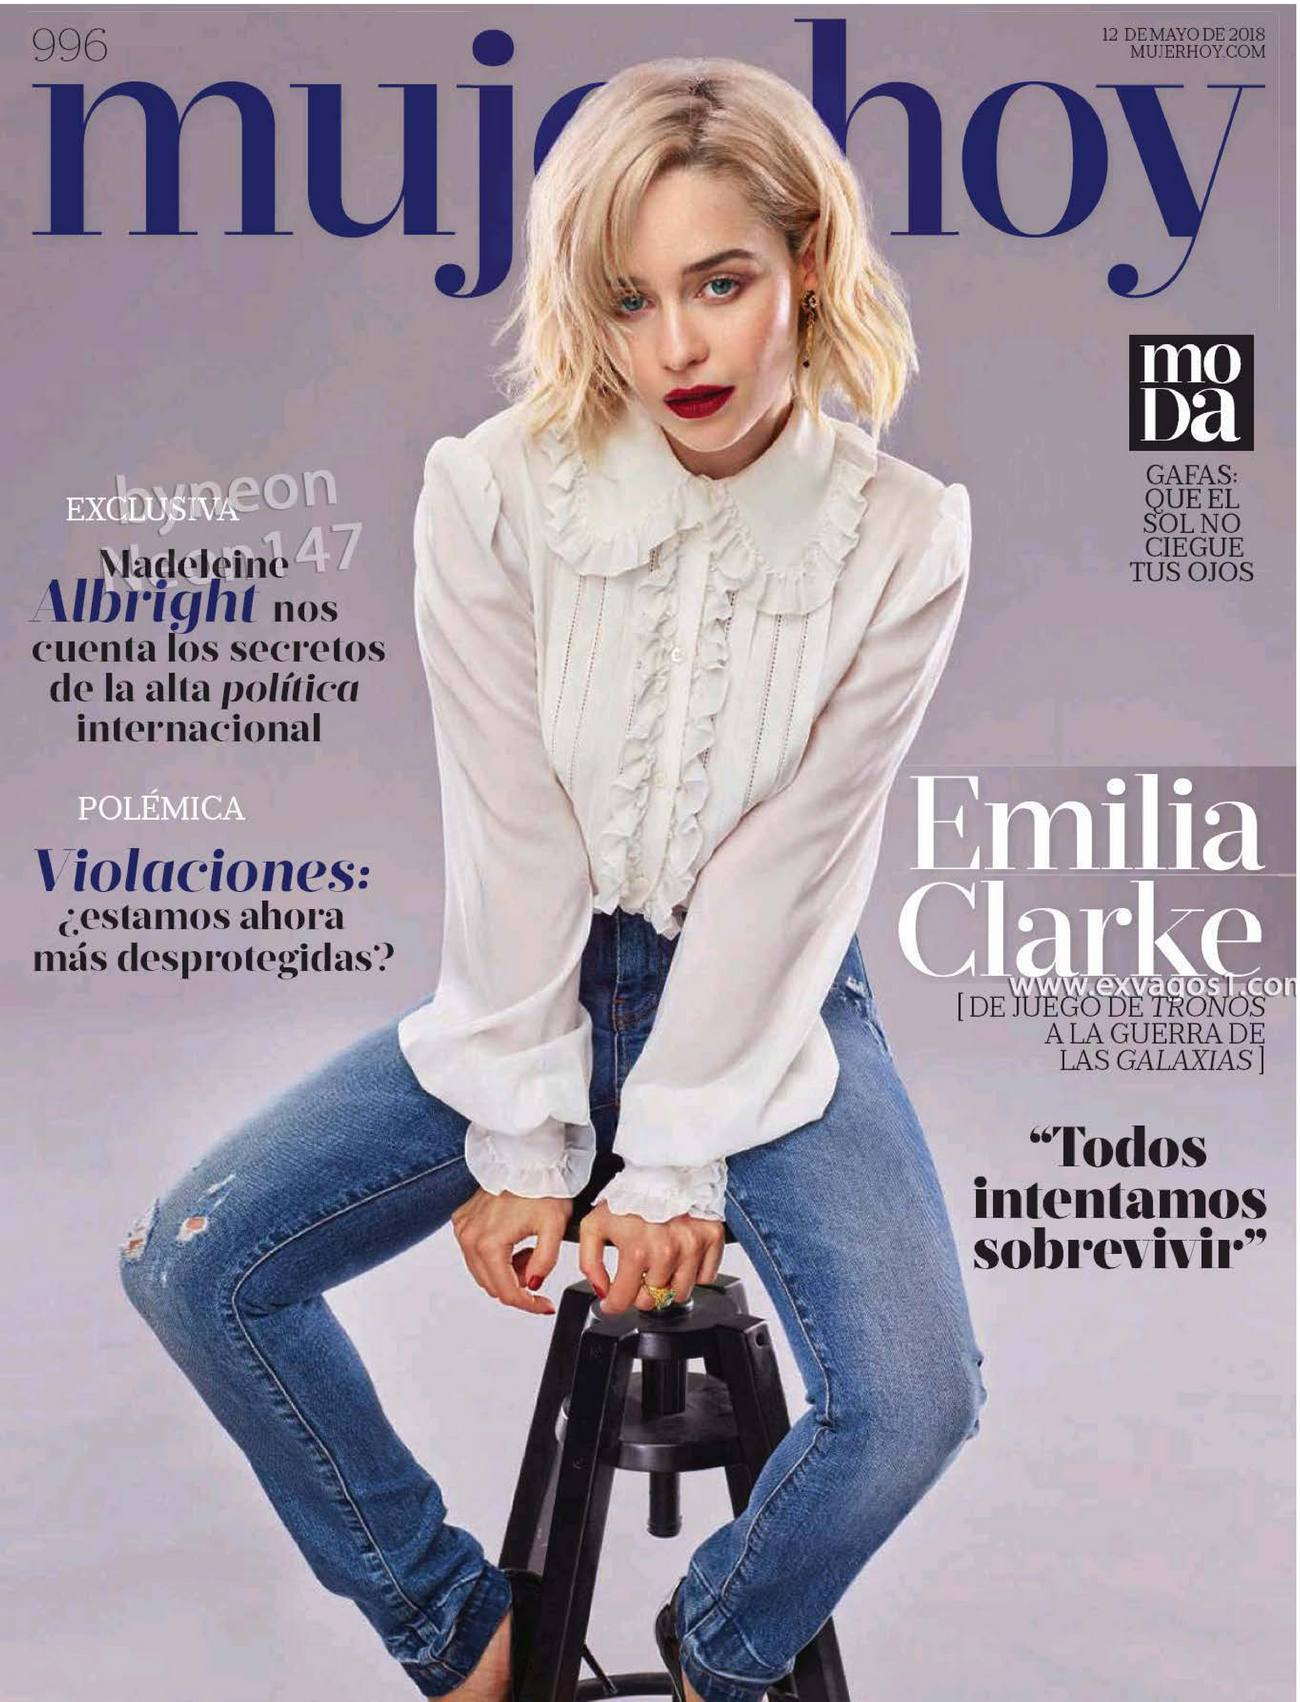 Emilia-Clarke-Mujer-Hoy-–-12-May-201800001.jpg